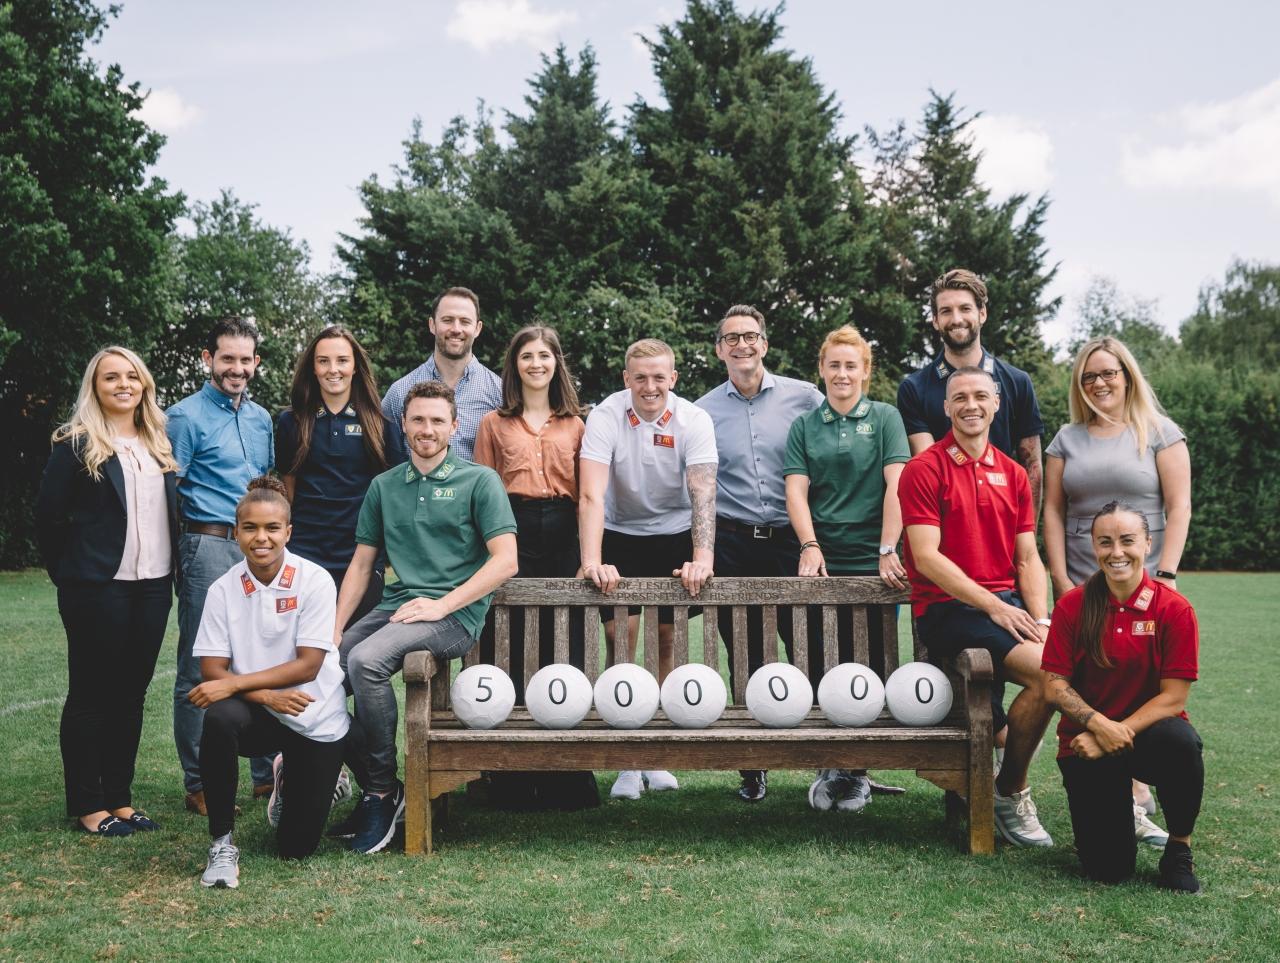 Jordan Pickford, Nikita Parris and other home nations football ambassadors launch McDonald's UK's new football sponsorship 3